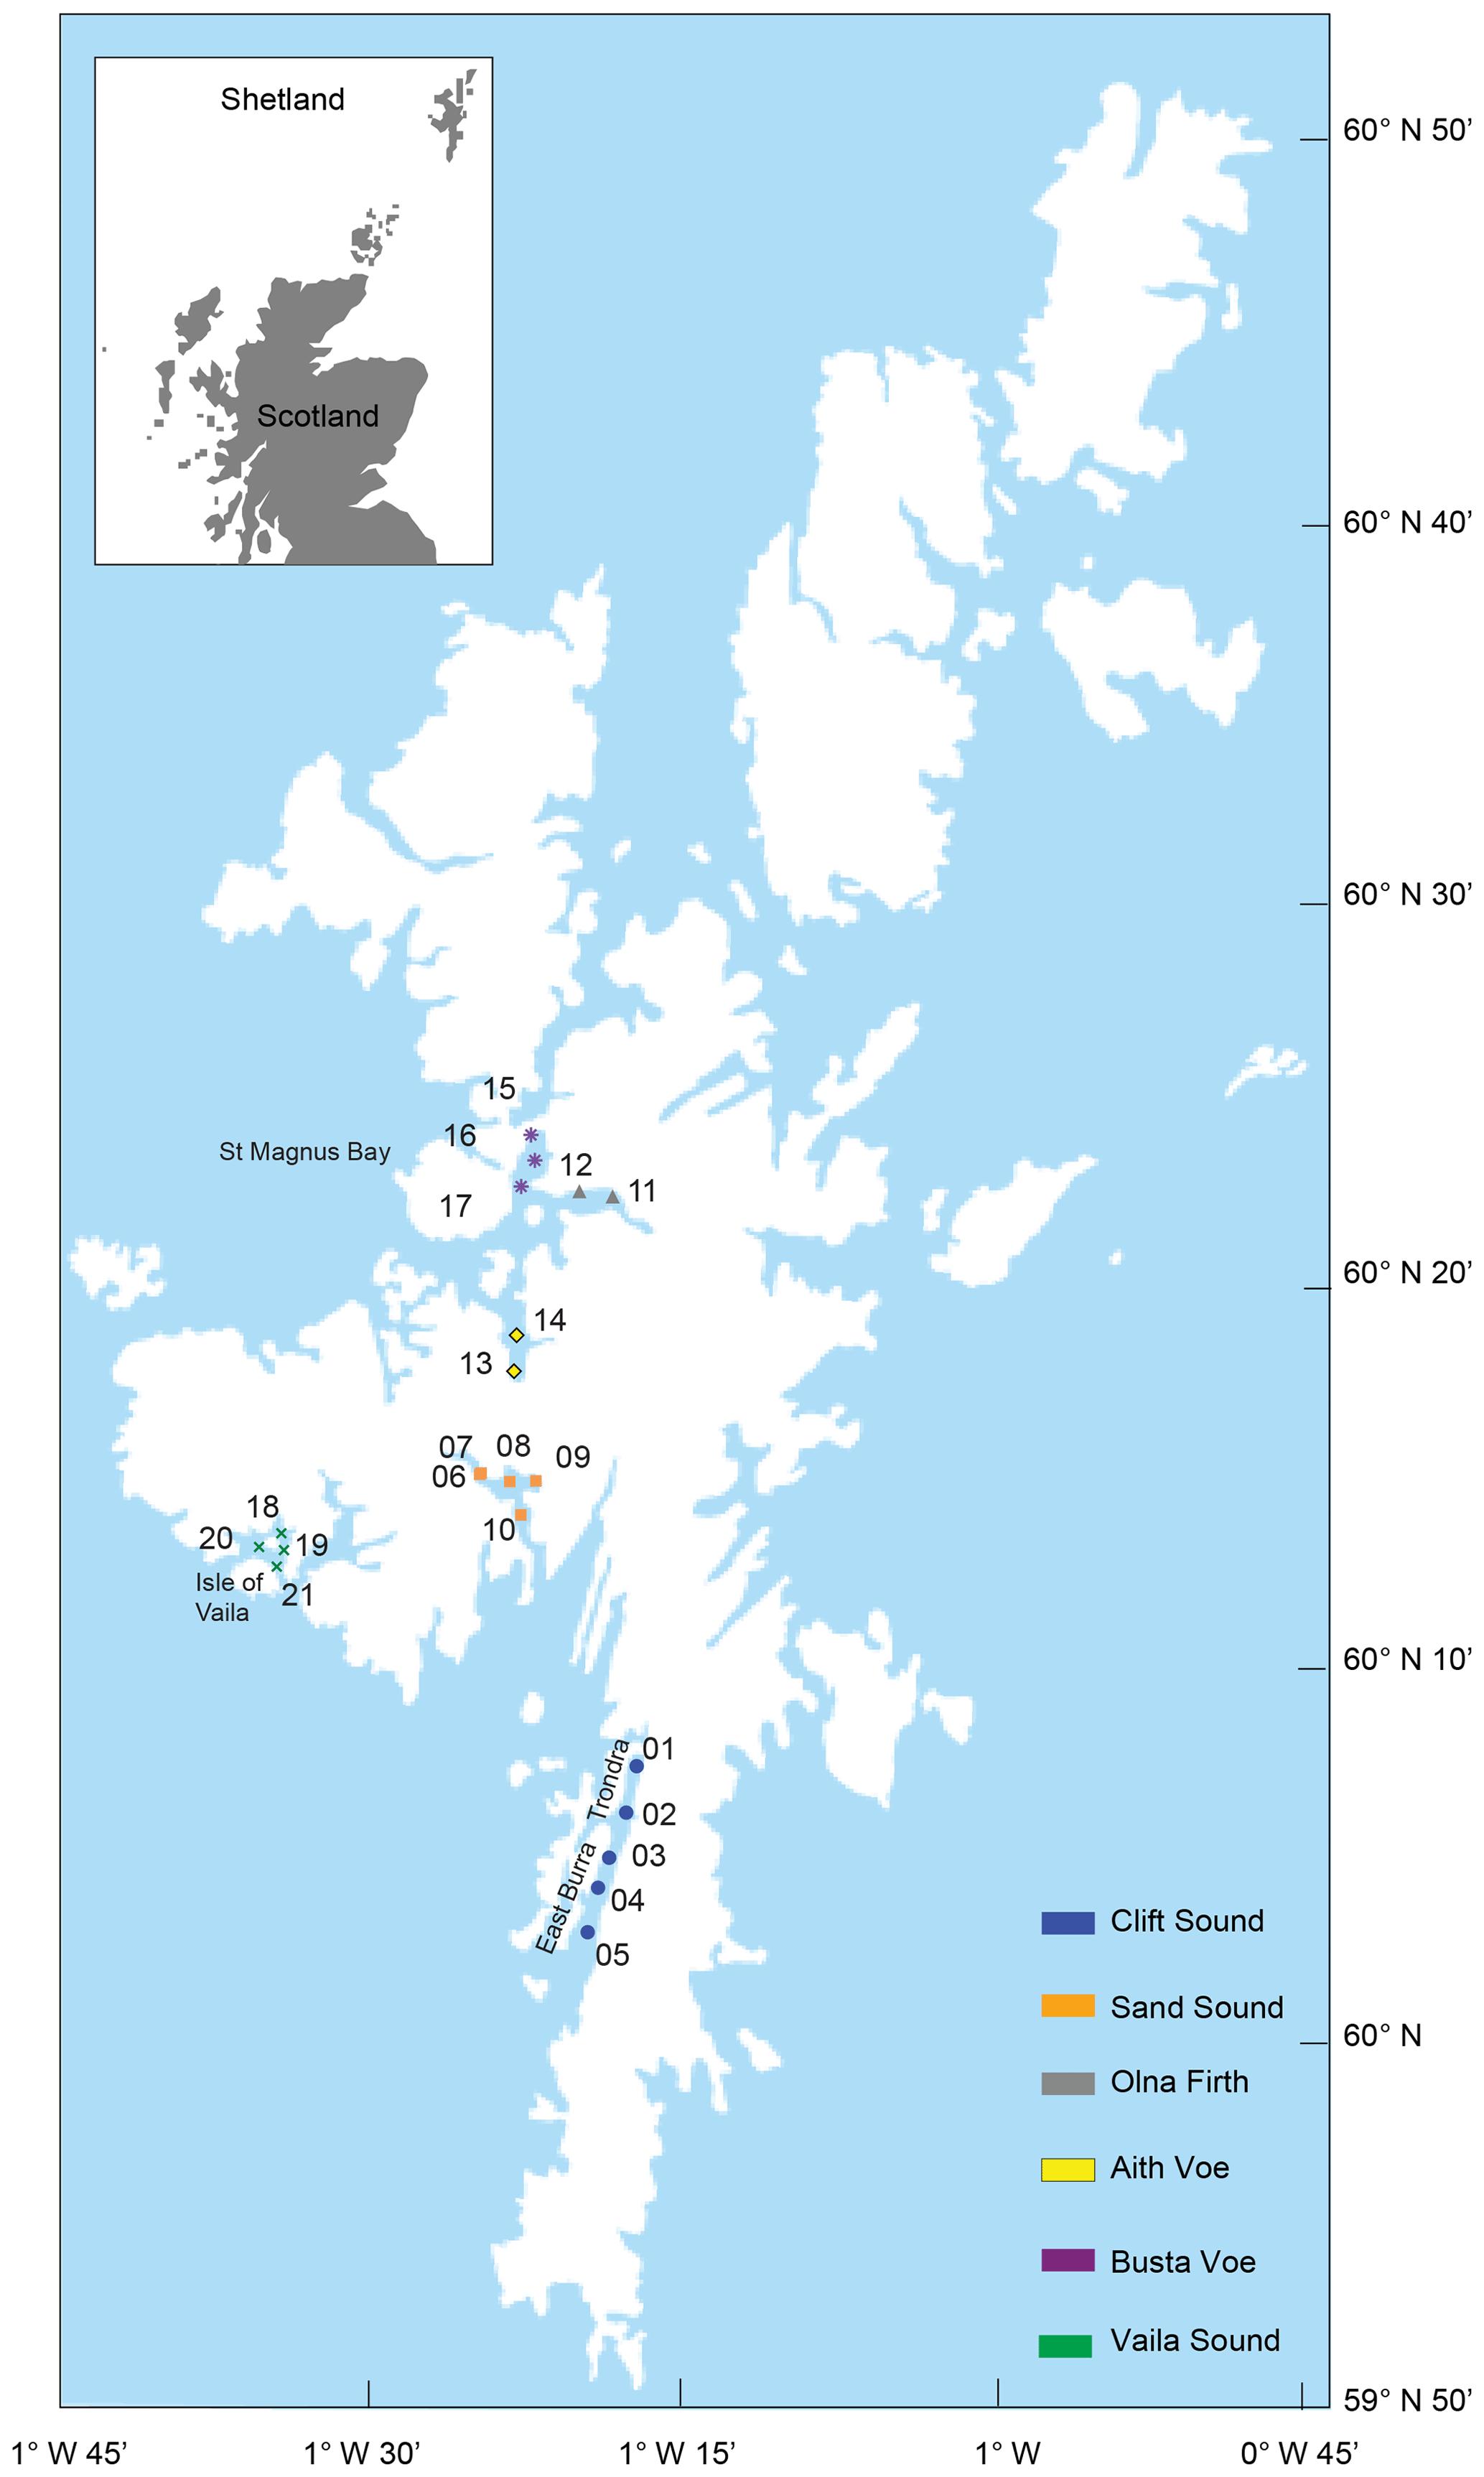 carbon Organic rich BG sedimentsbenthic foraminifera as l3KTcuFJ51